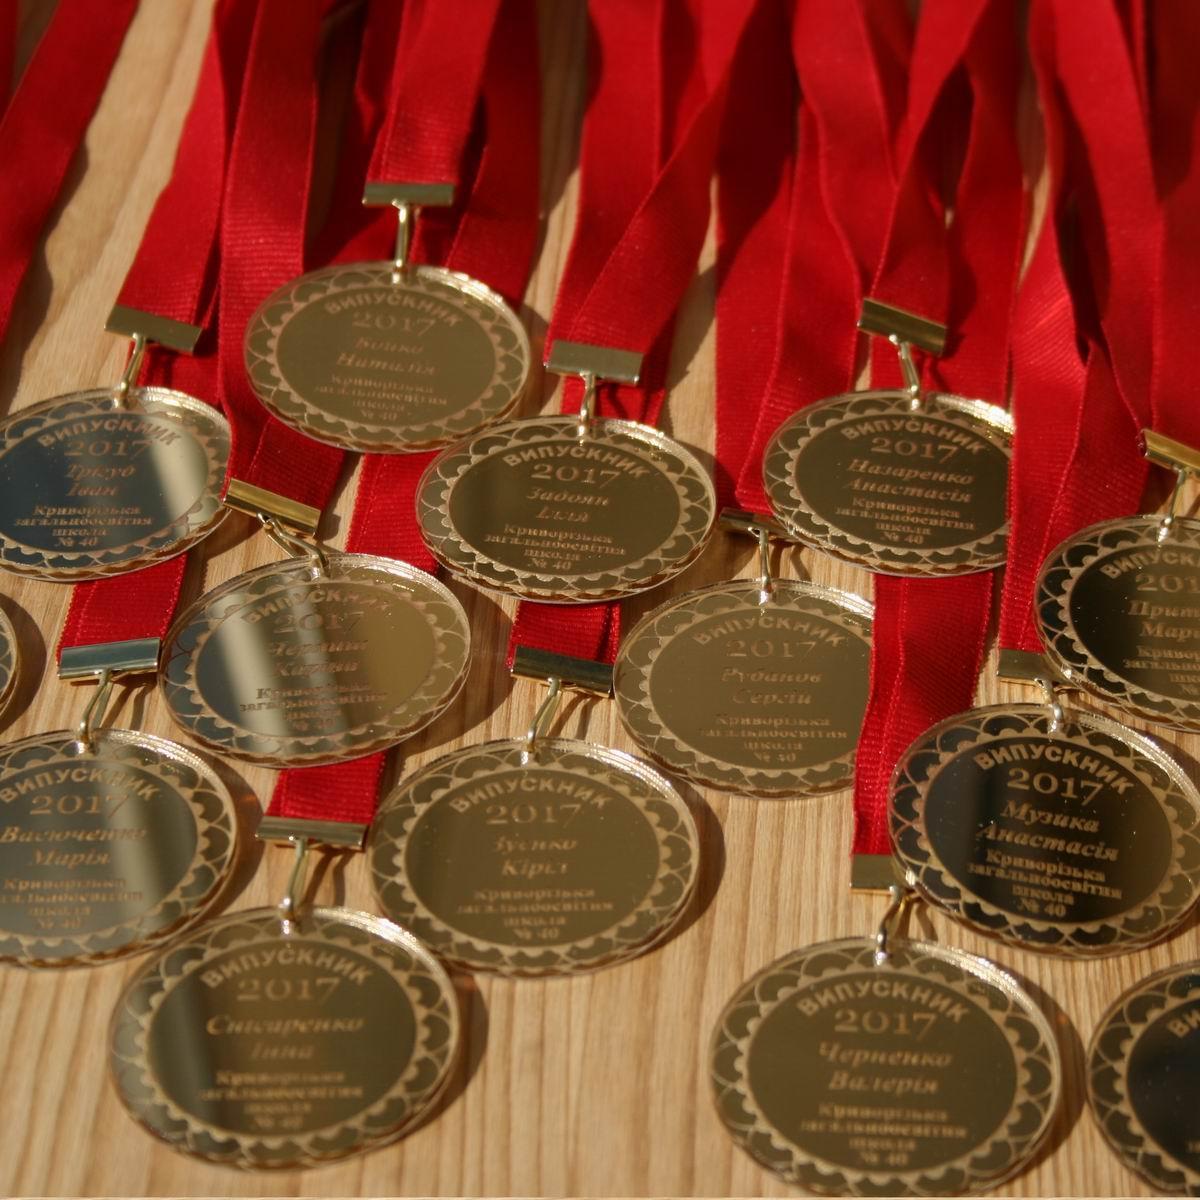 Медаль выпускникам детского сада (Медалі для випускників дитячого садка)